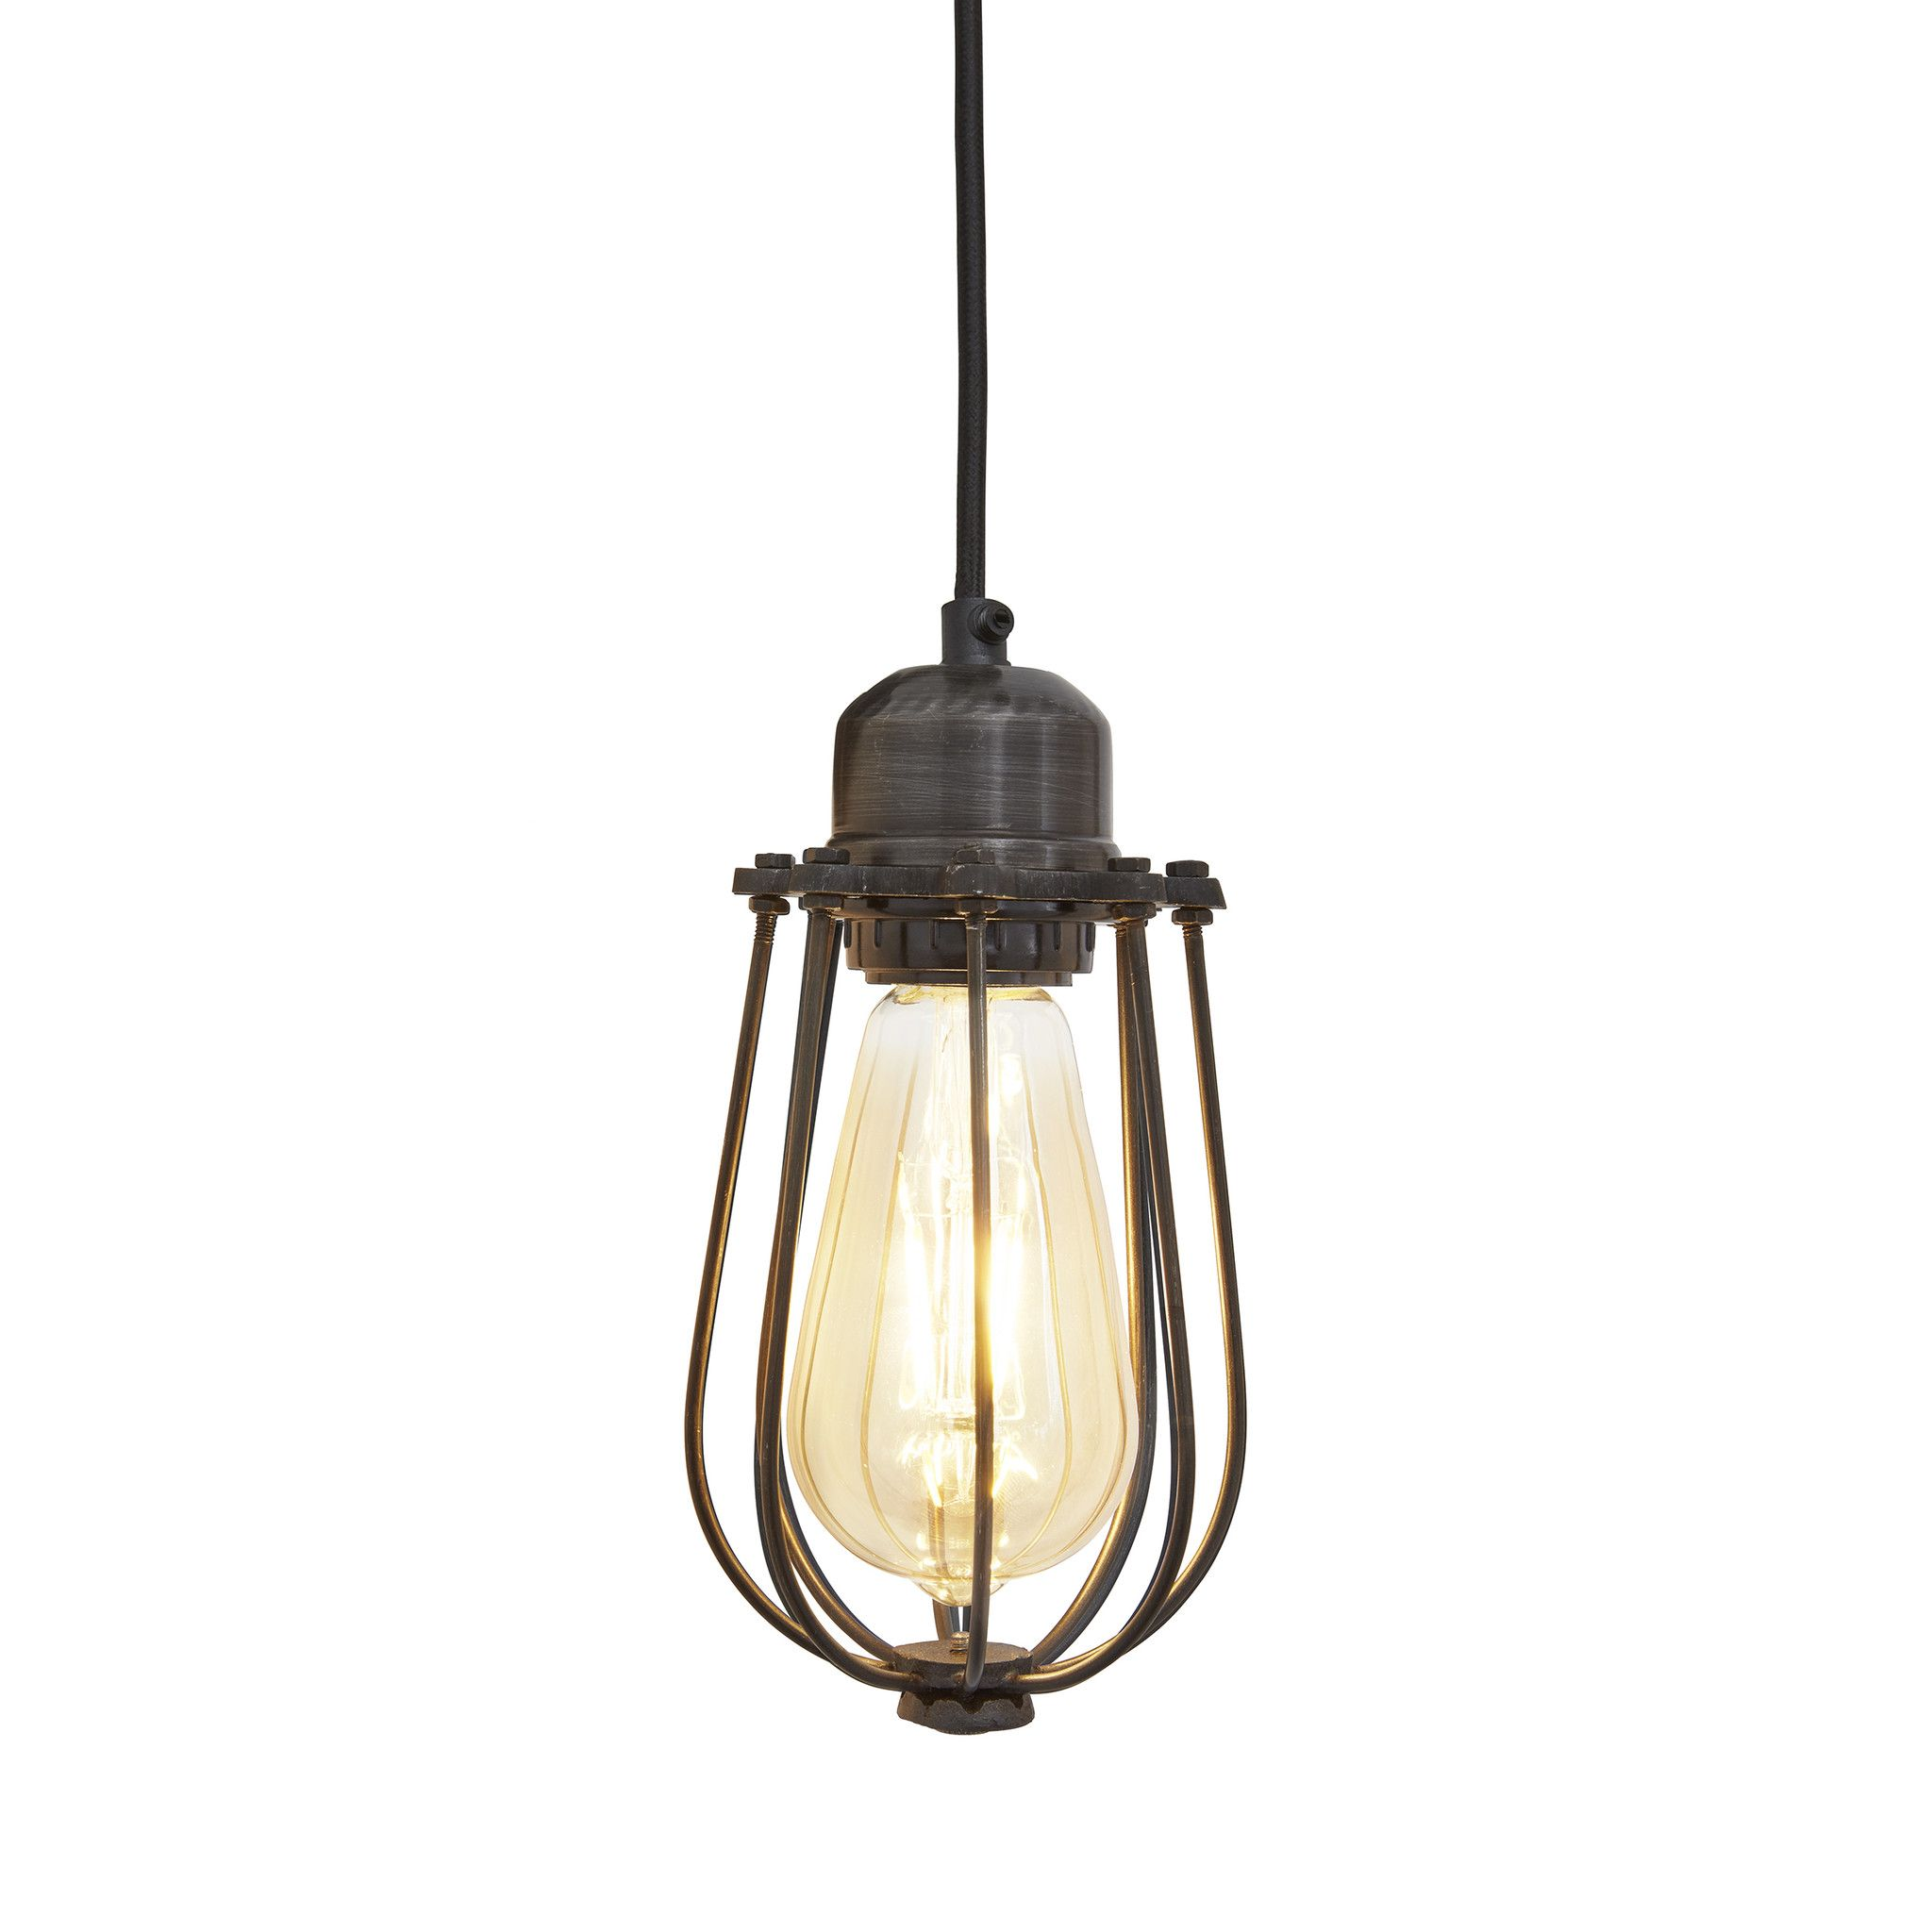 orlando vintage cage pendant light dark pewter lightbulb rh pinterest com